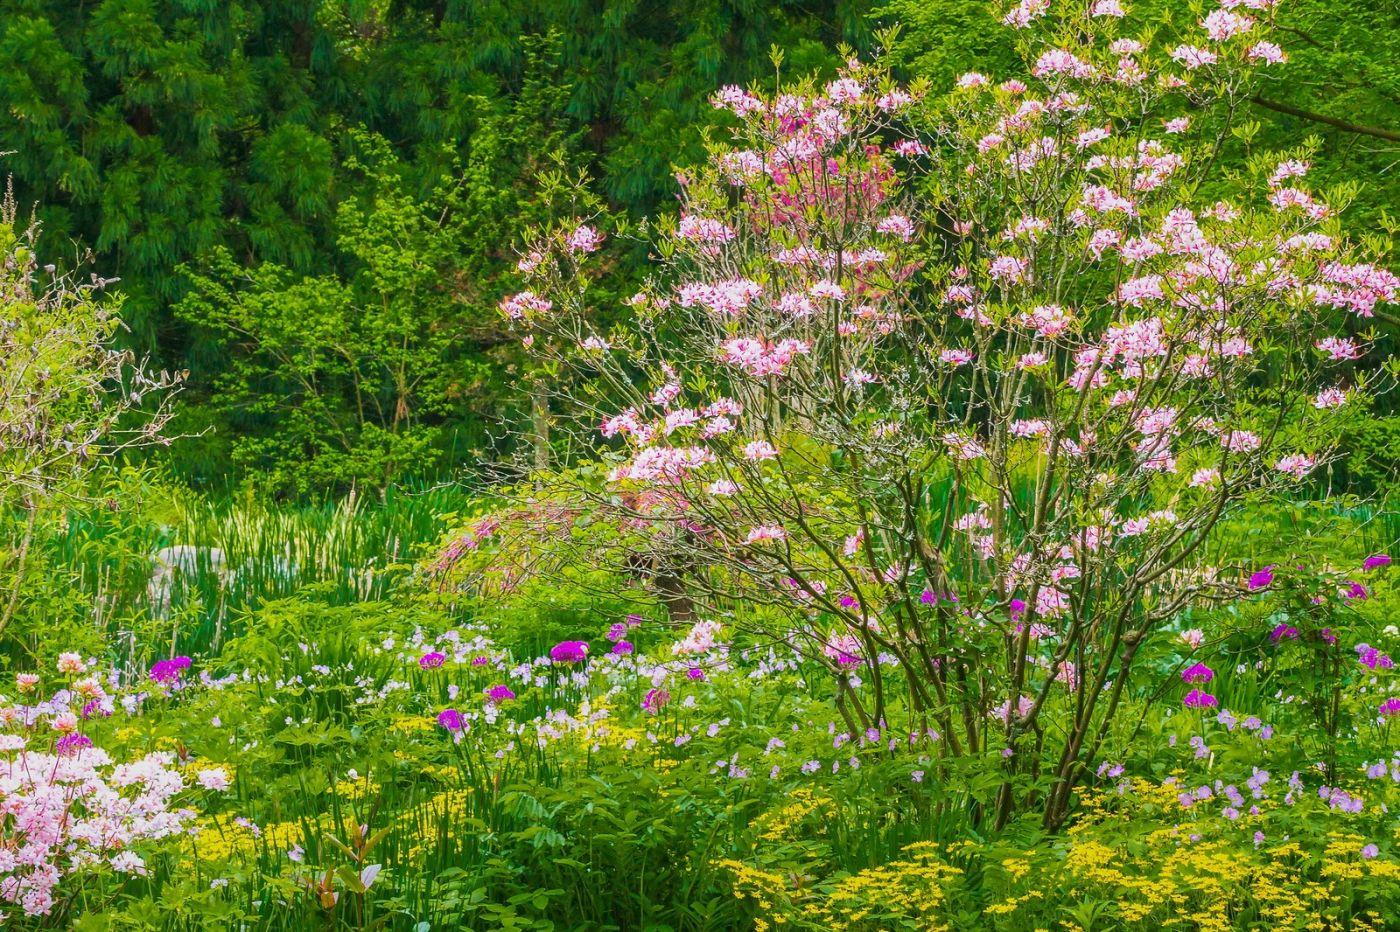 Chanticleer花园,有梦想的季节_图1-24